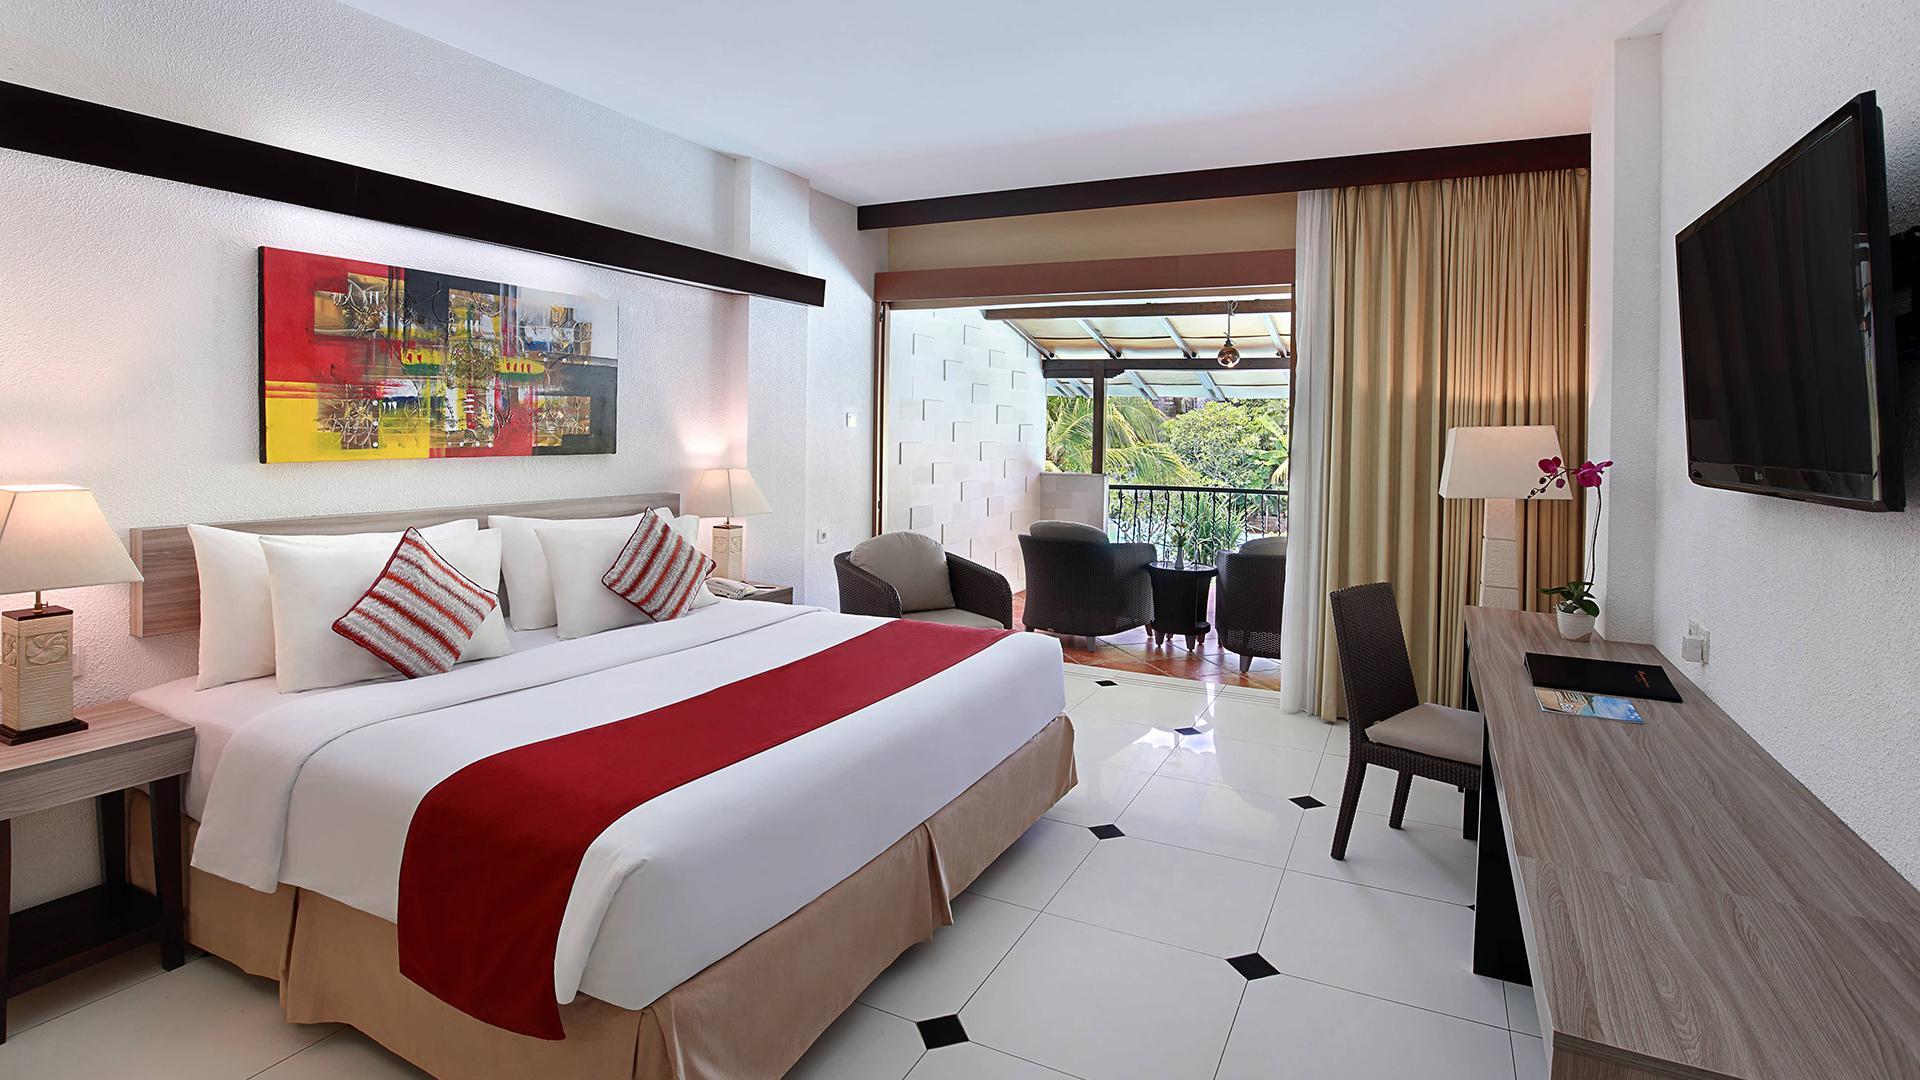 Premier Pool View Room  image 1 at Swiss-Belhotel Segara Nusa Dua by Kabupaten Badung, Bali, Indonesia